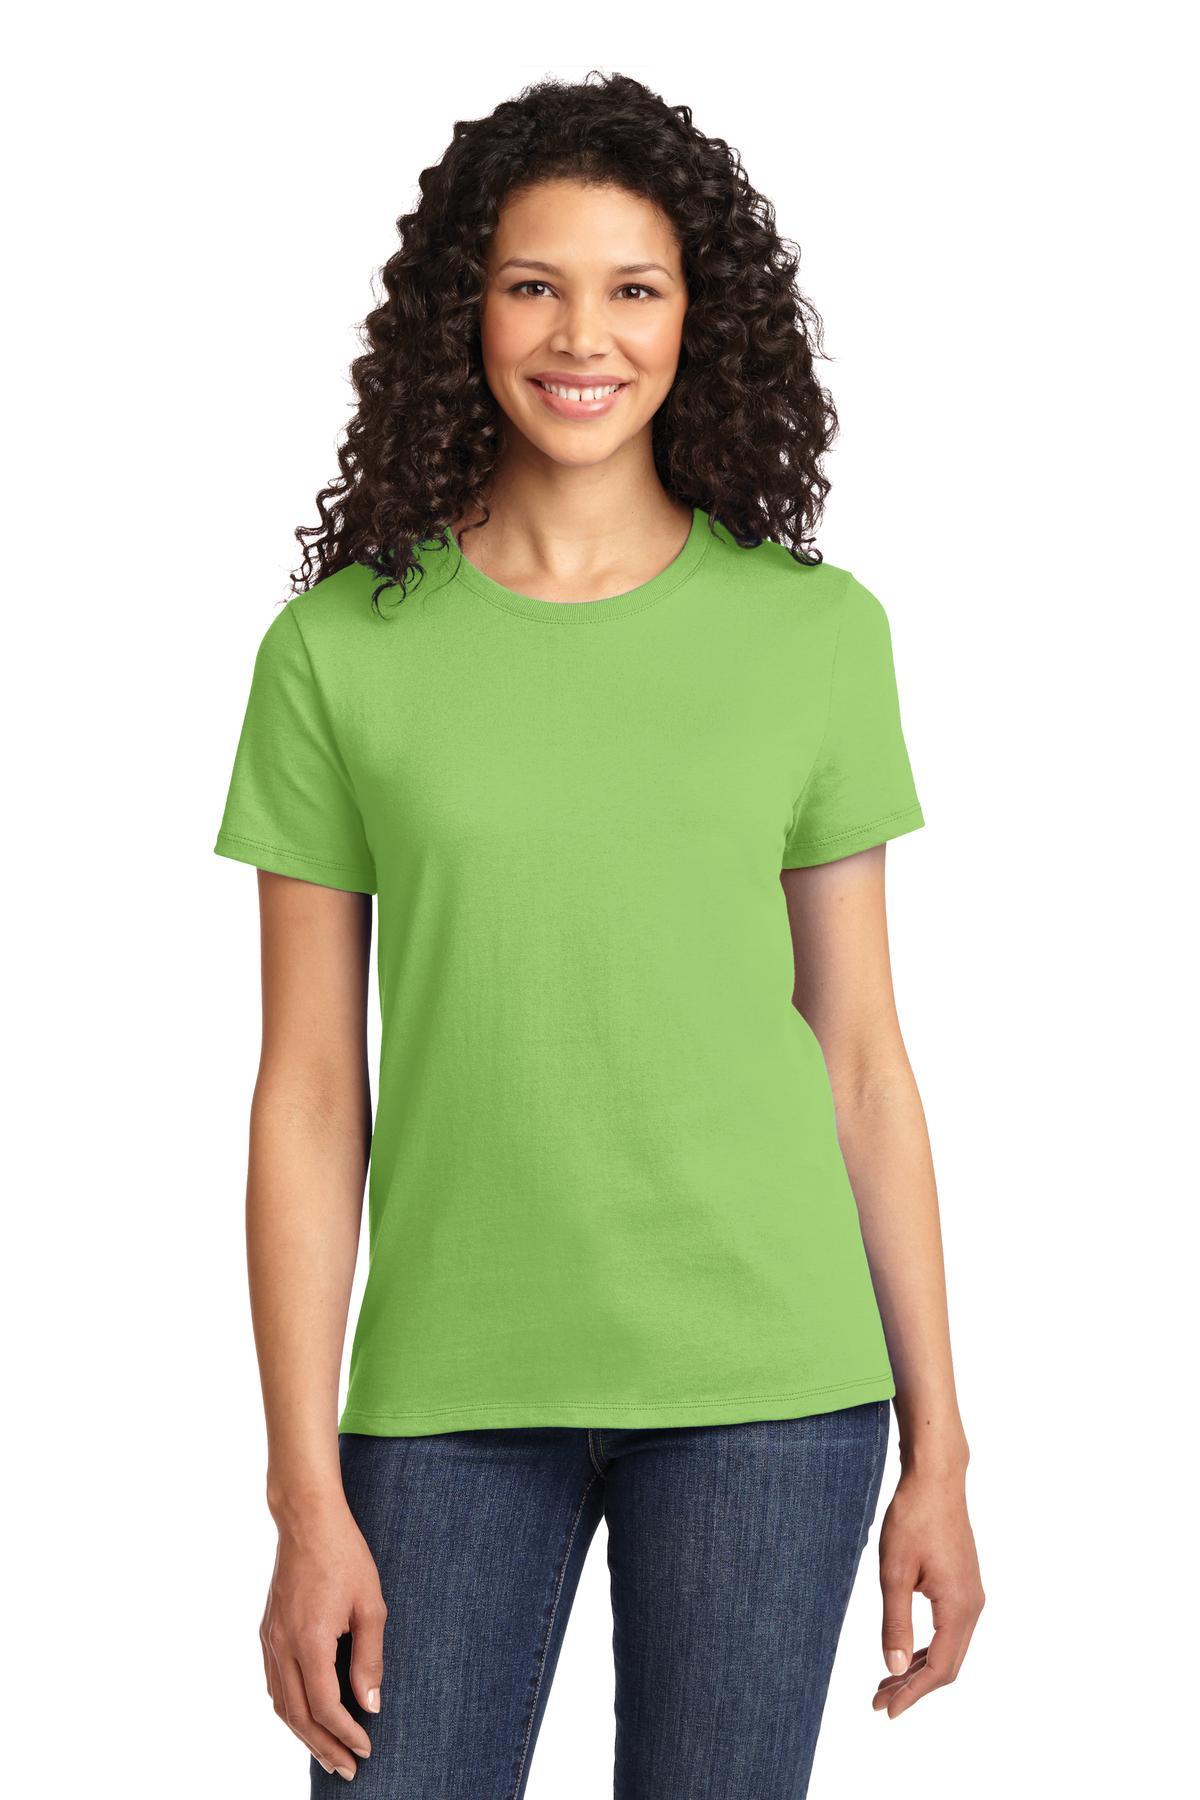 T-Shirts-100-Cotton-82